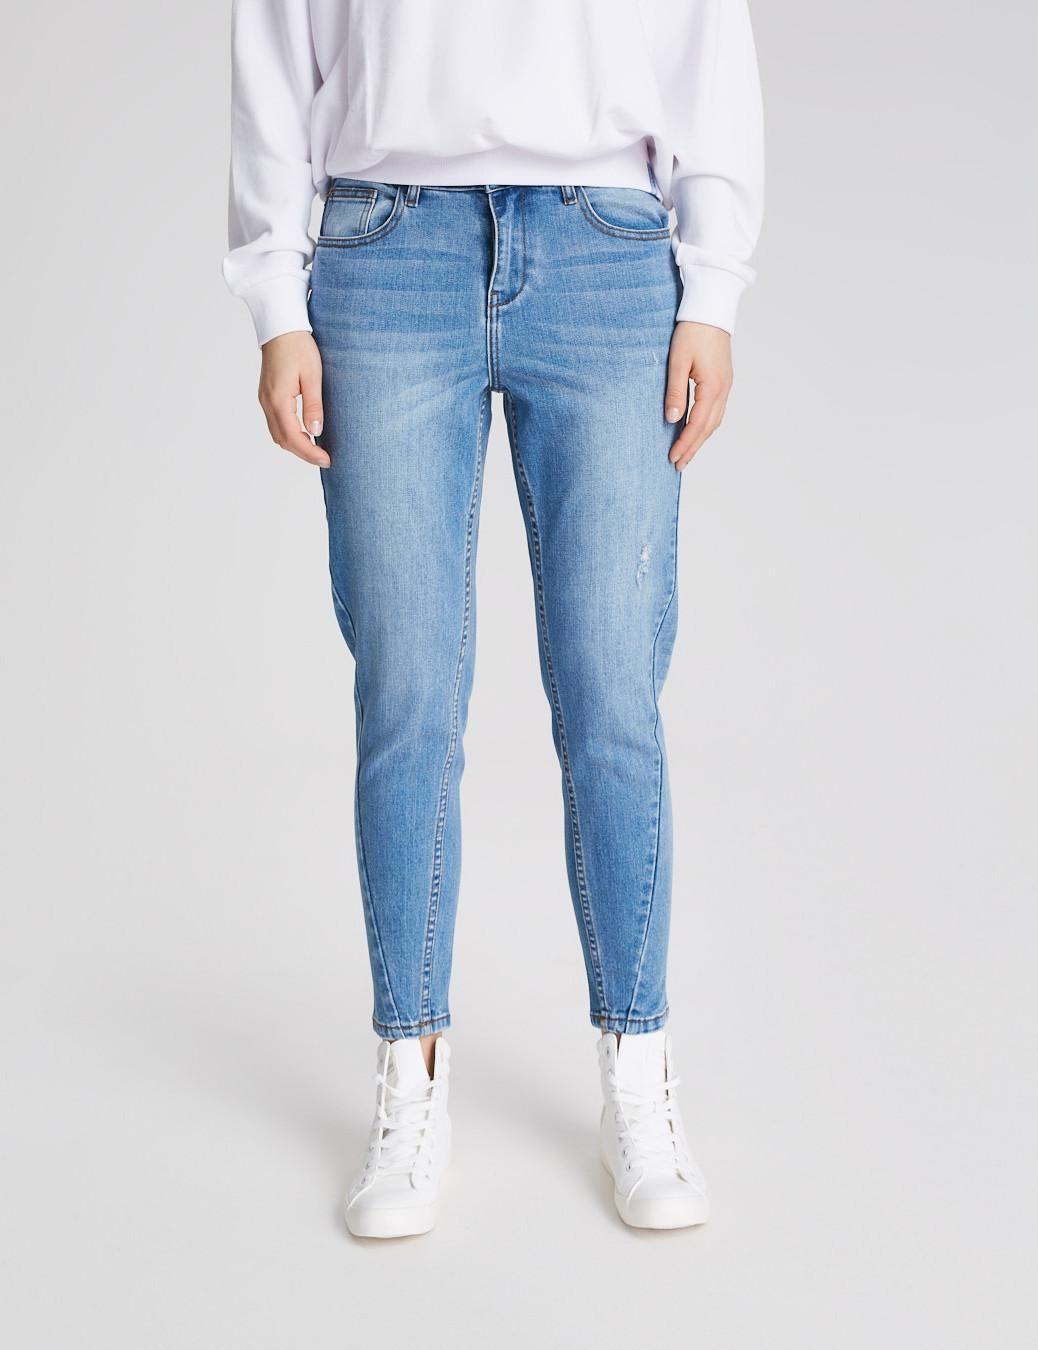 Pin By Olka Cieslak On Zakupy Skinny Jeans Skinny Pants